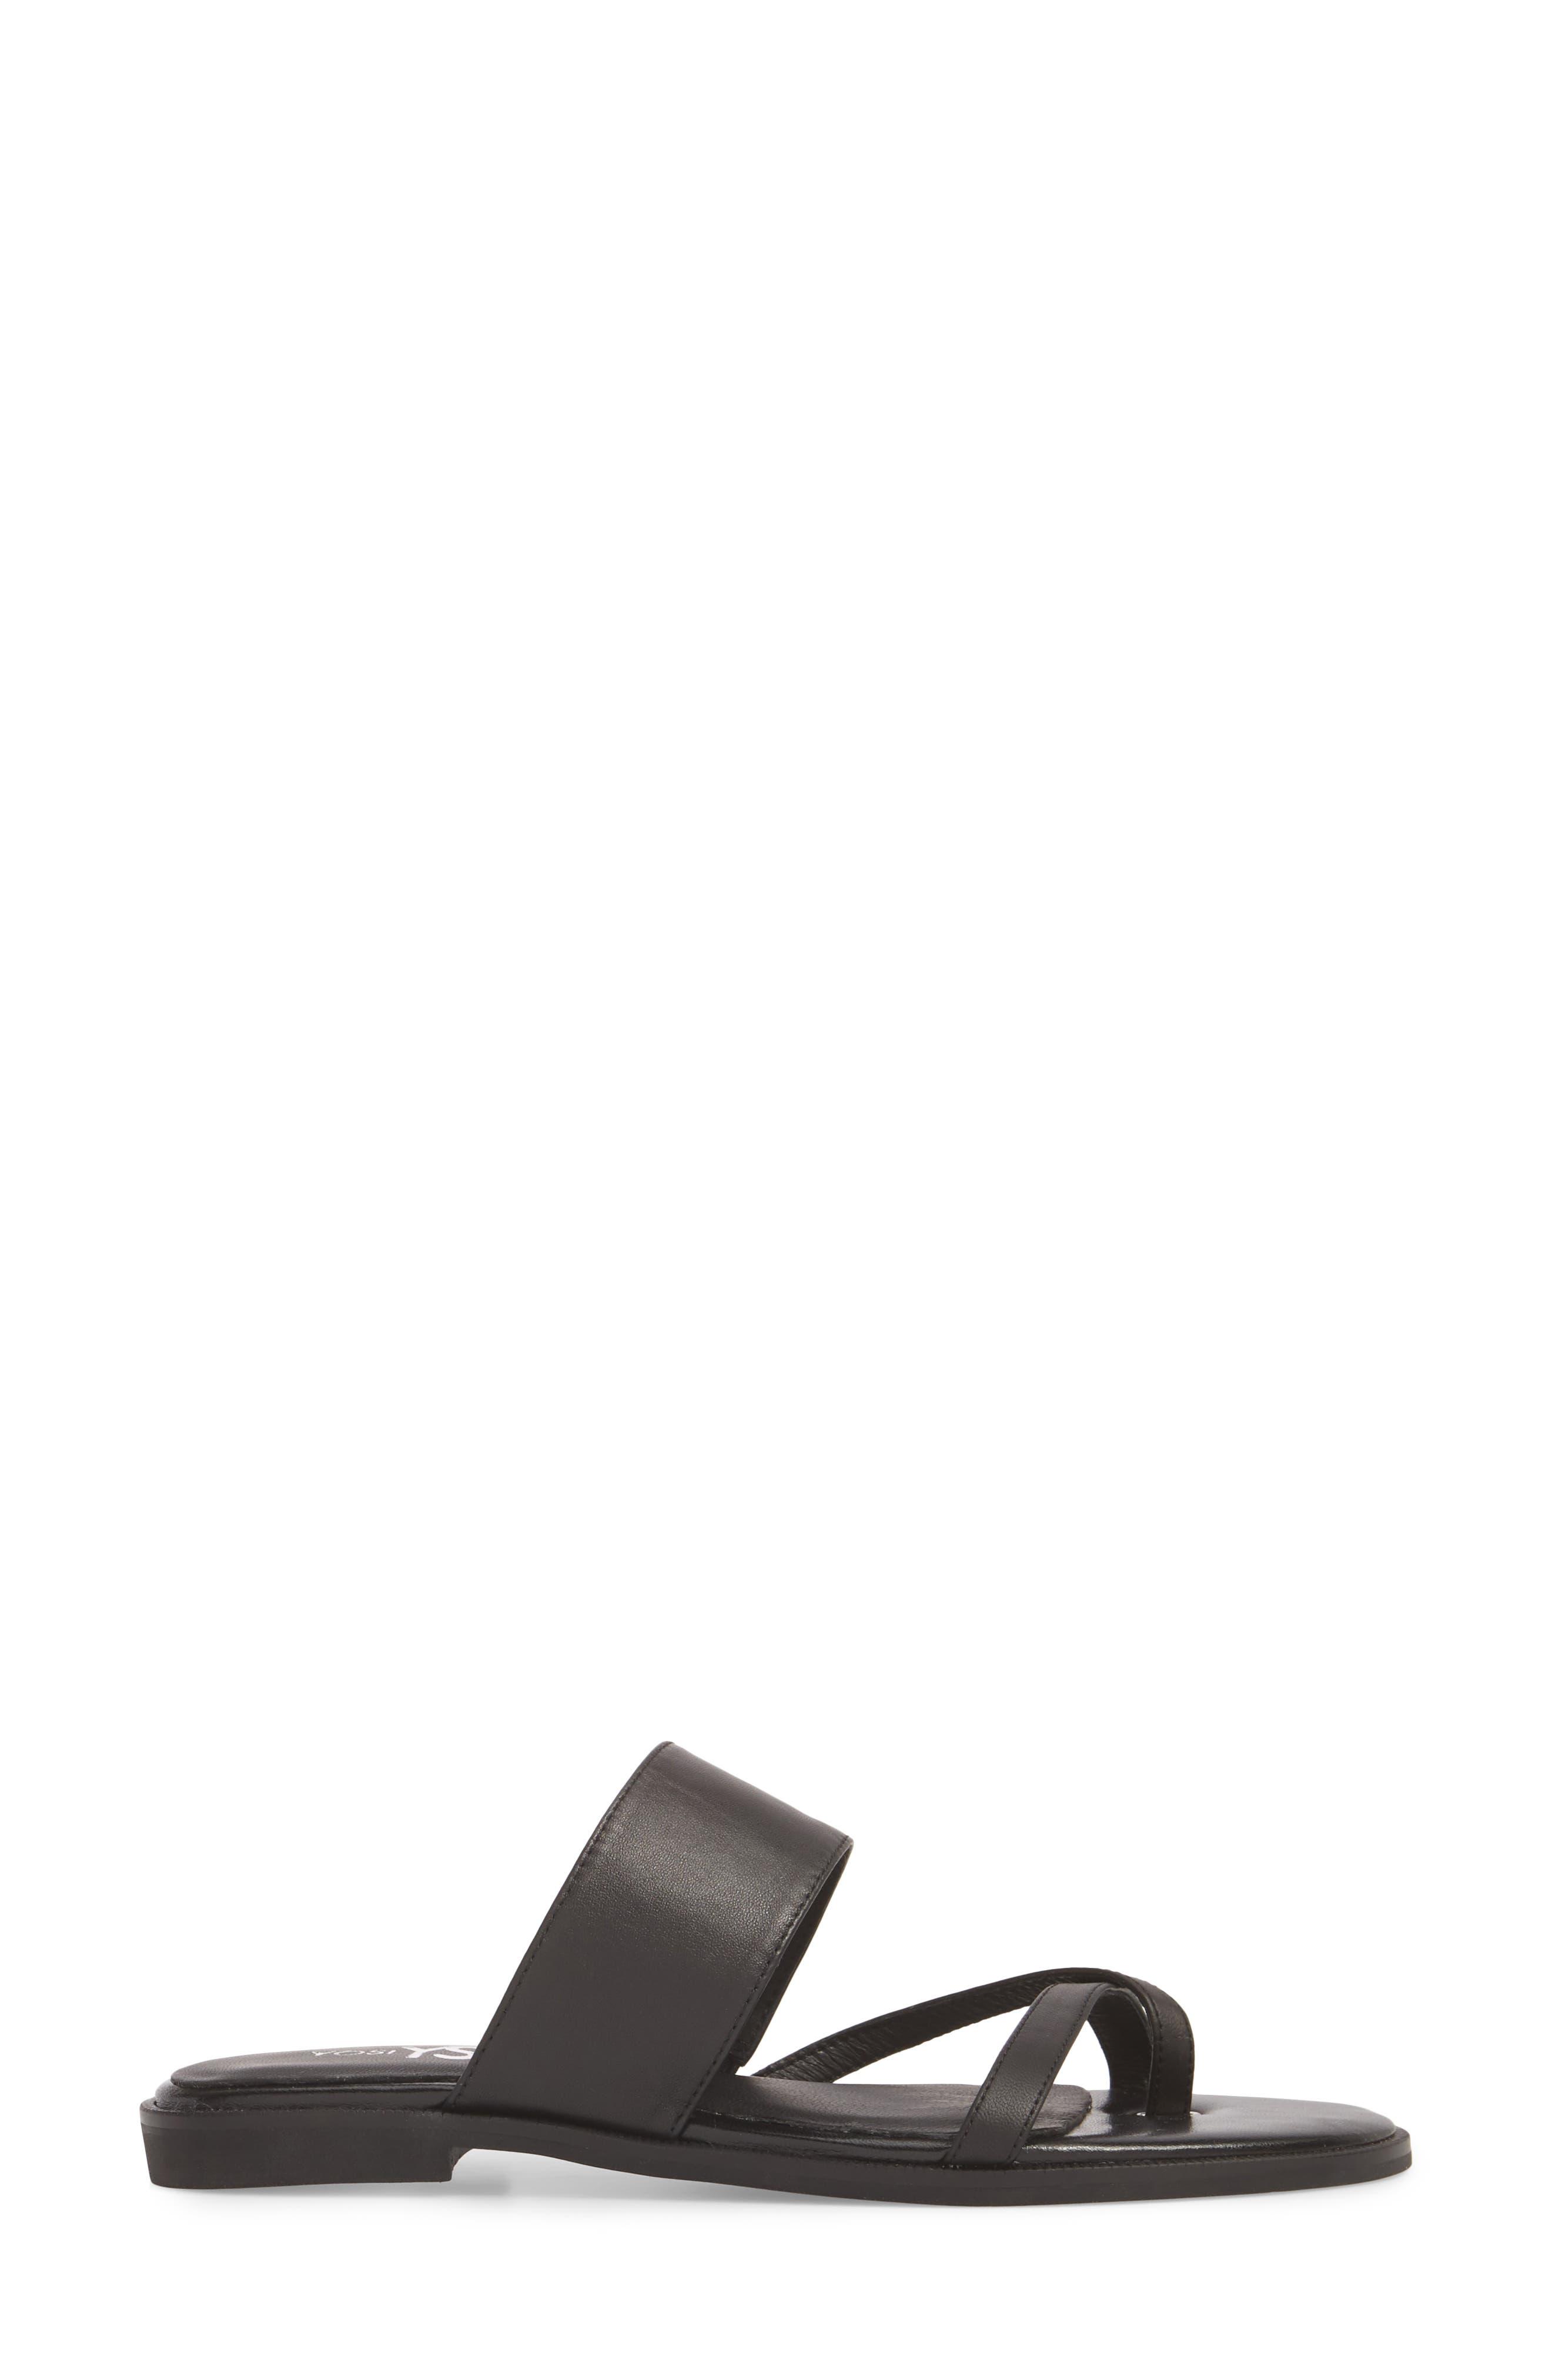 Carina Slide Sandal,                             Alternate thumbnail 5, color,